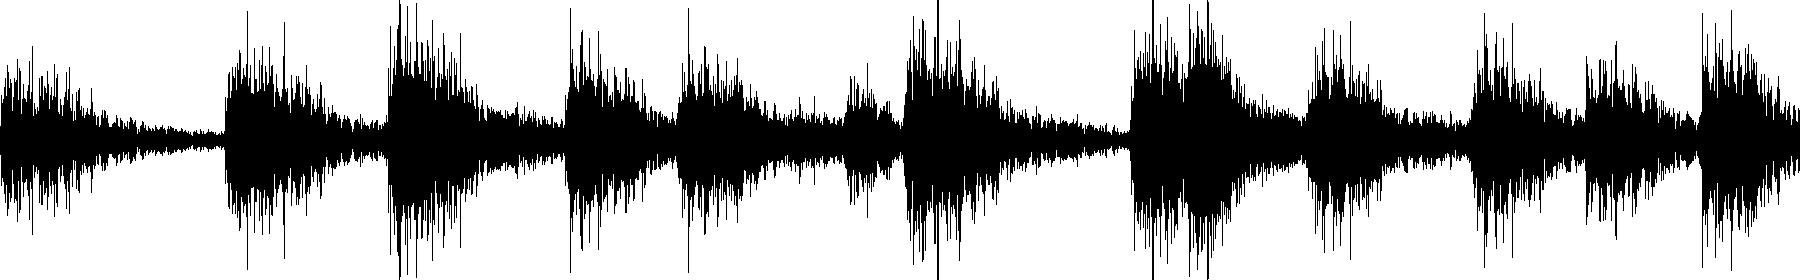 shs ch musicloop 127 piano1 cm